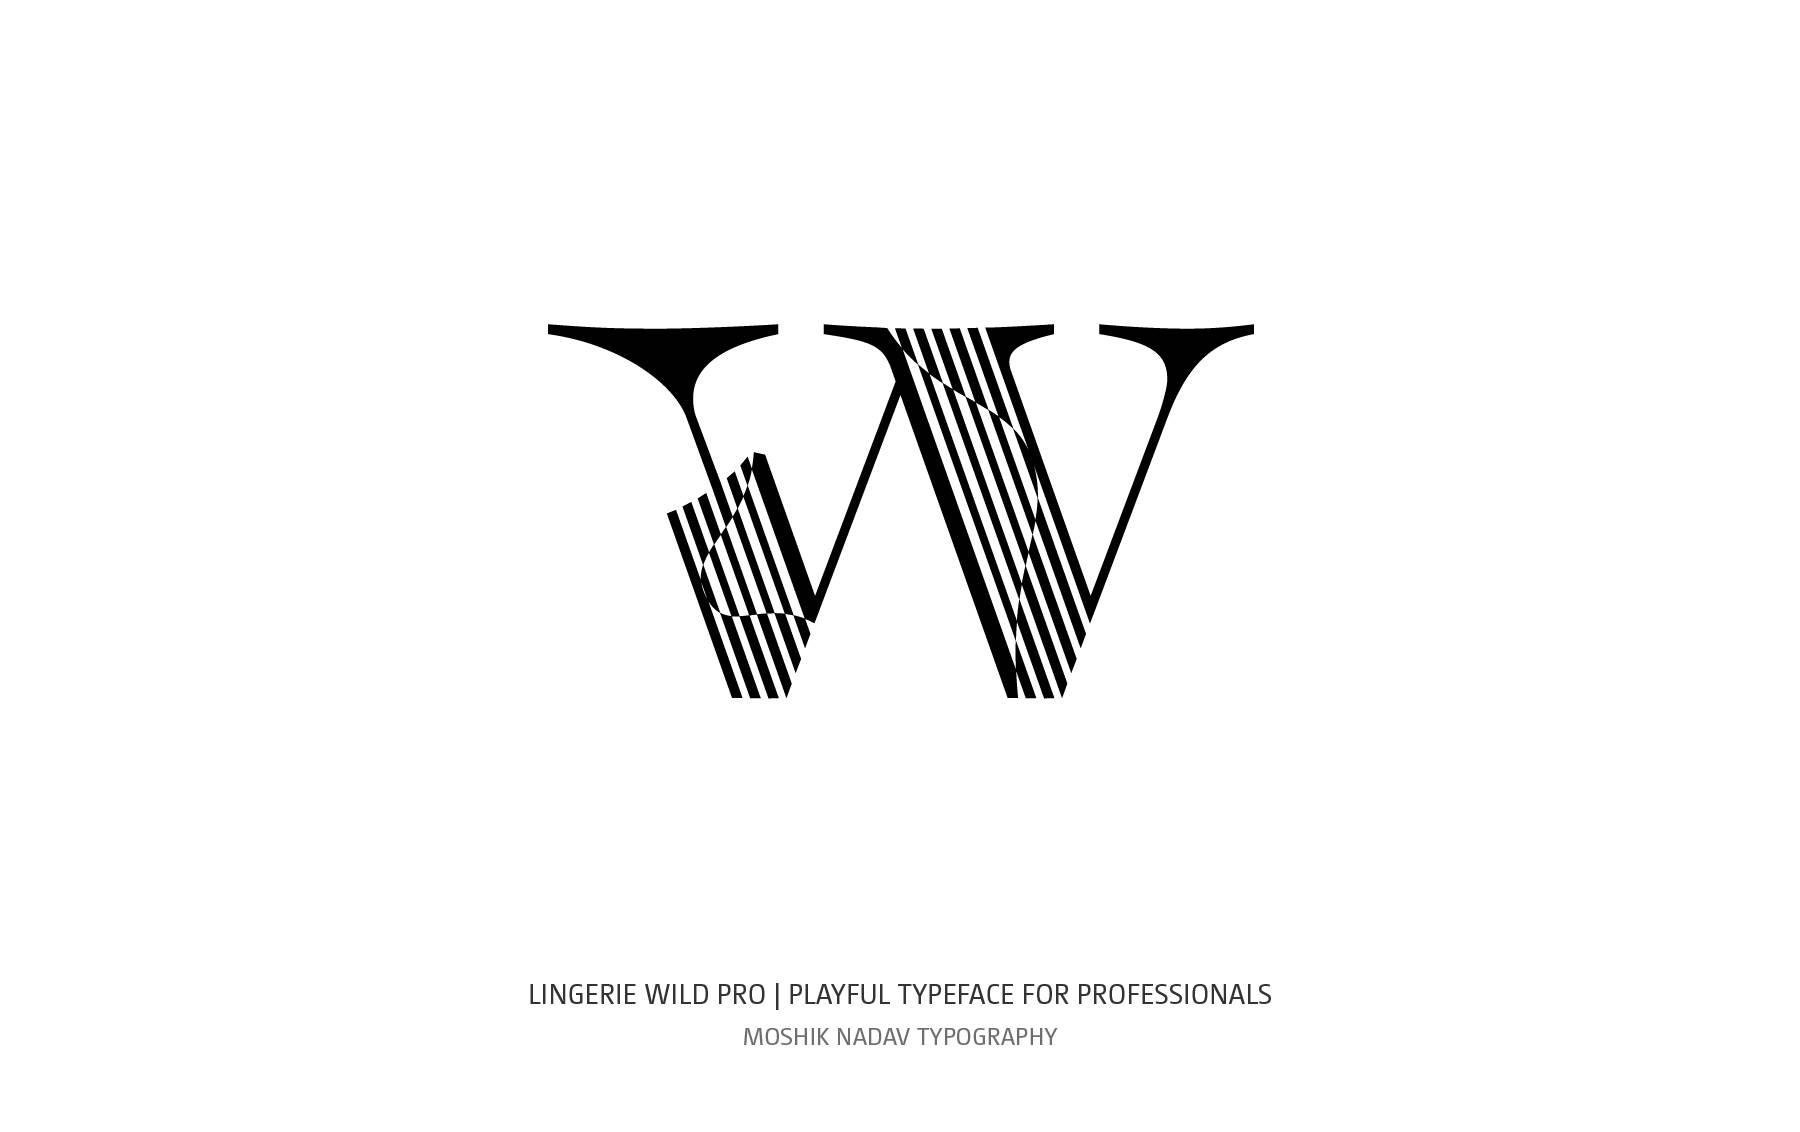 Lingerie Wild Pro typeface designed by Moshik Nadav Typography